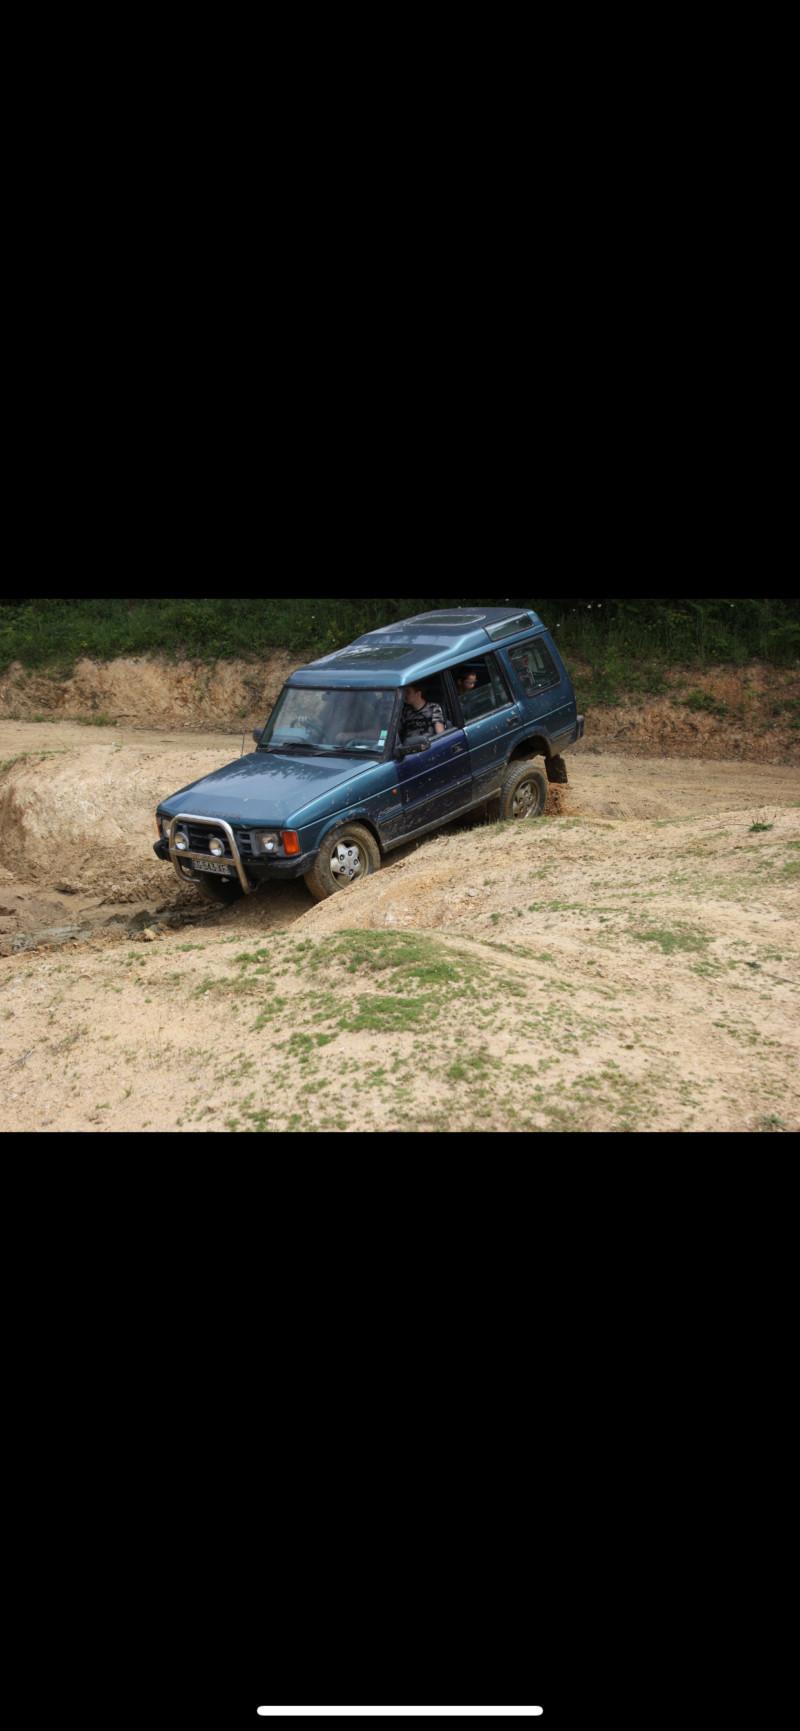 Le Land Rover Discovery 200 TDI de Noel85 15590212